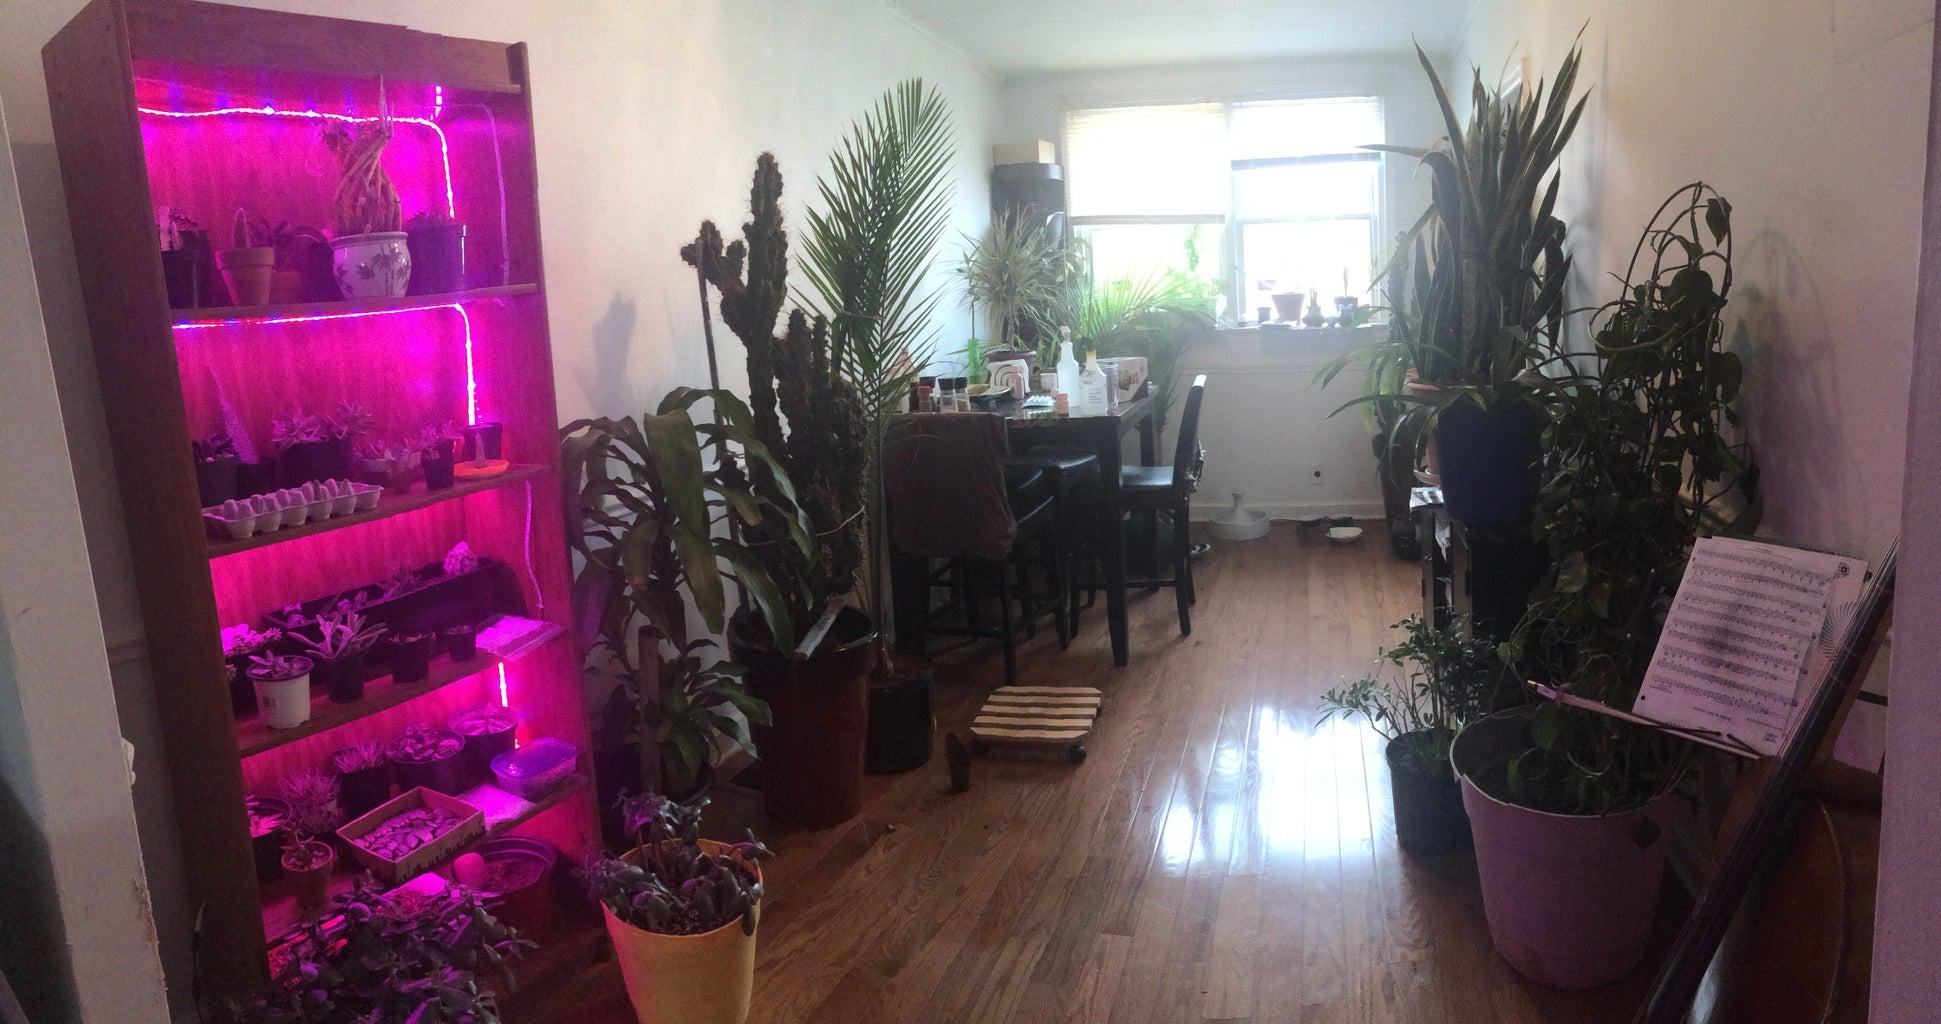 Grow Case - Plants Not Books